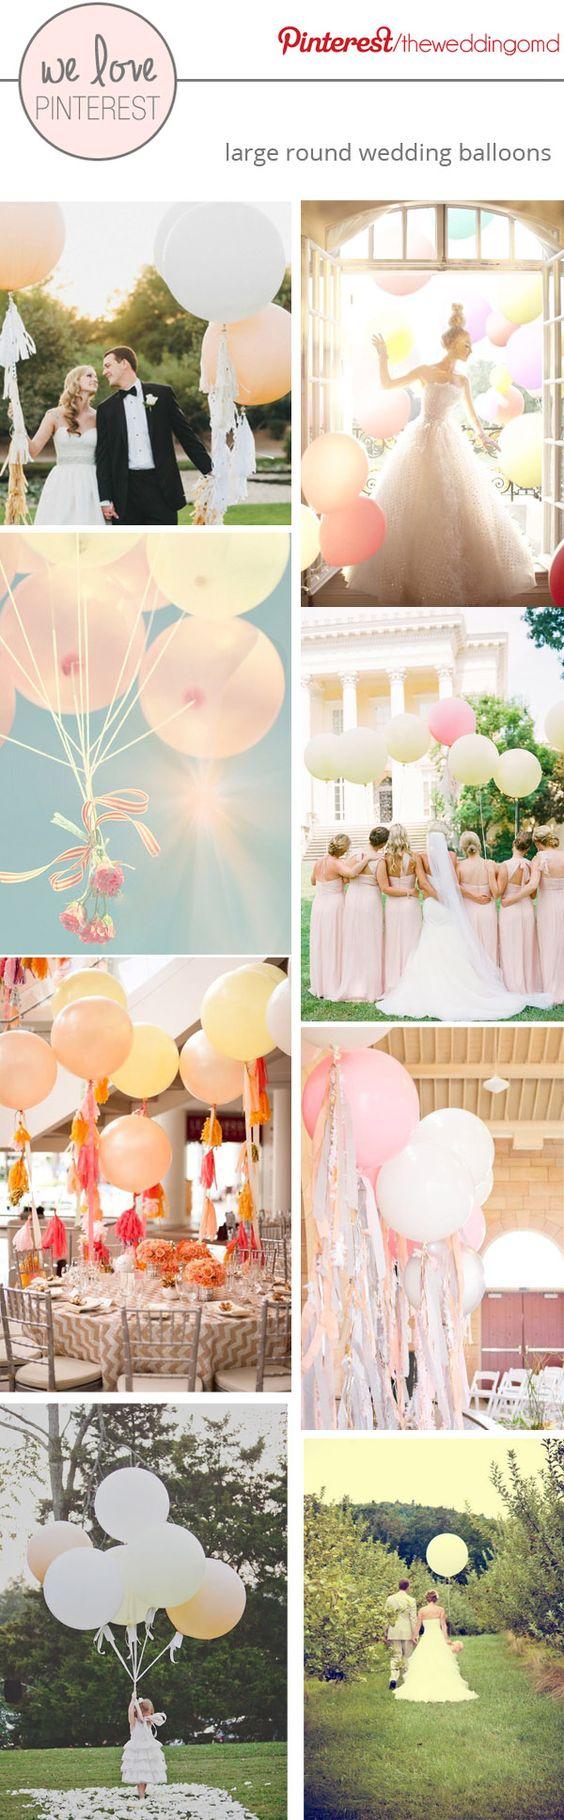 Large wedding balloons effortless romance yellow